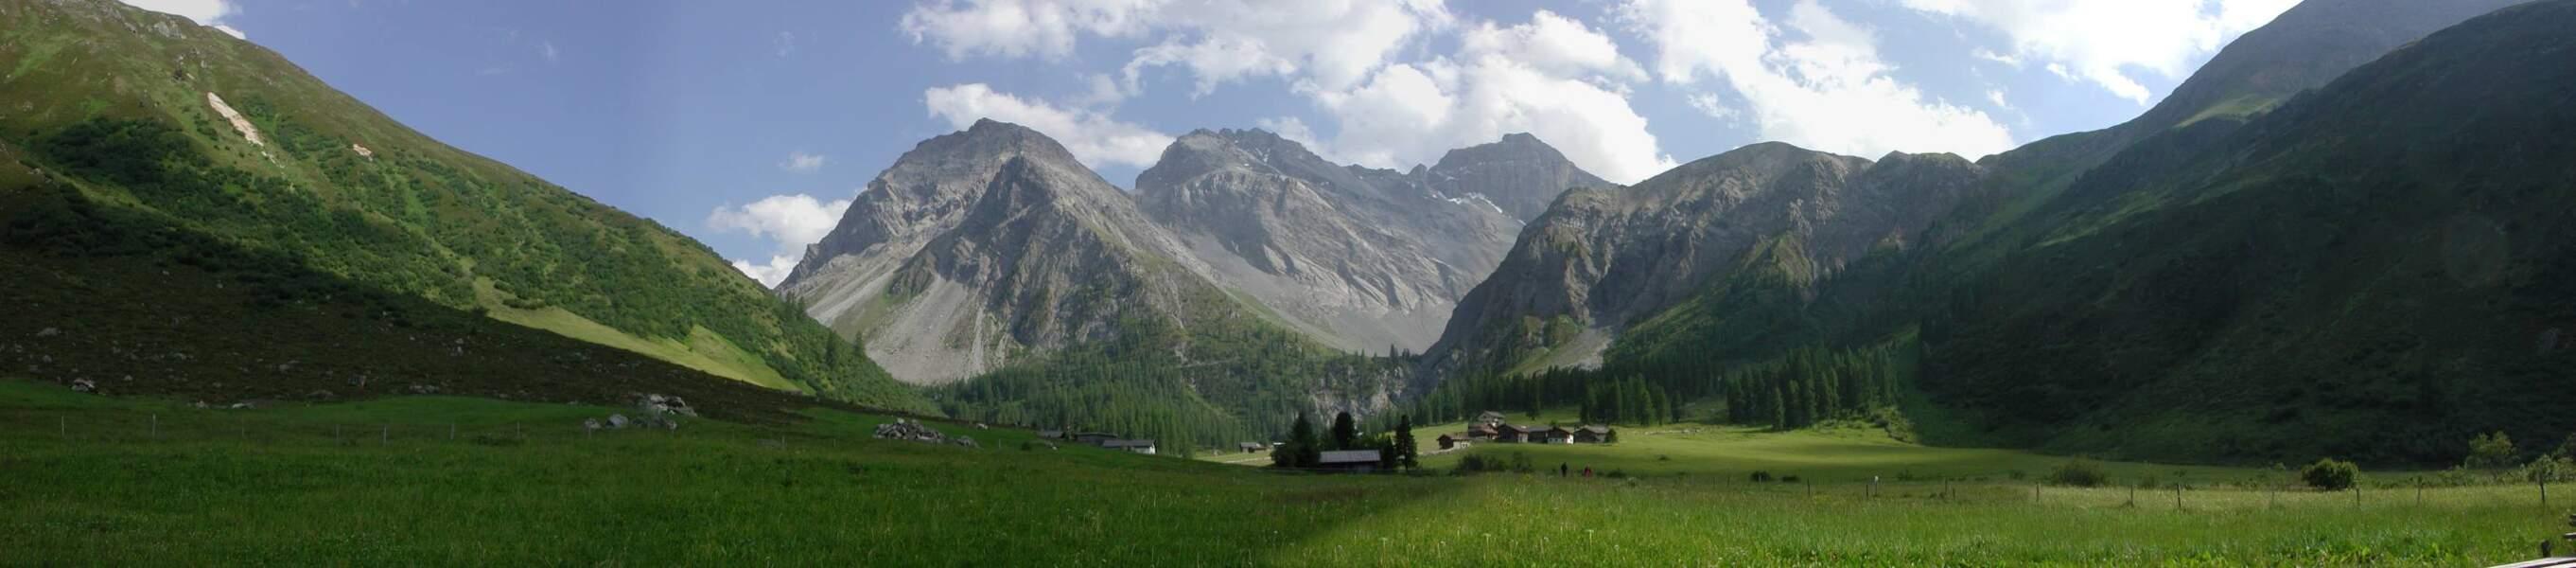 La vallée de Sertig près de Davos